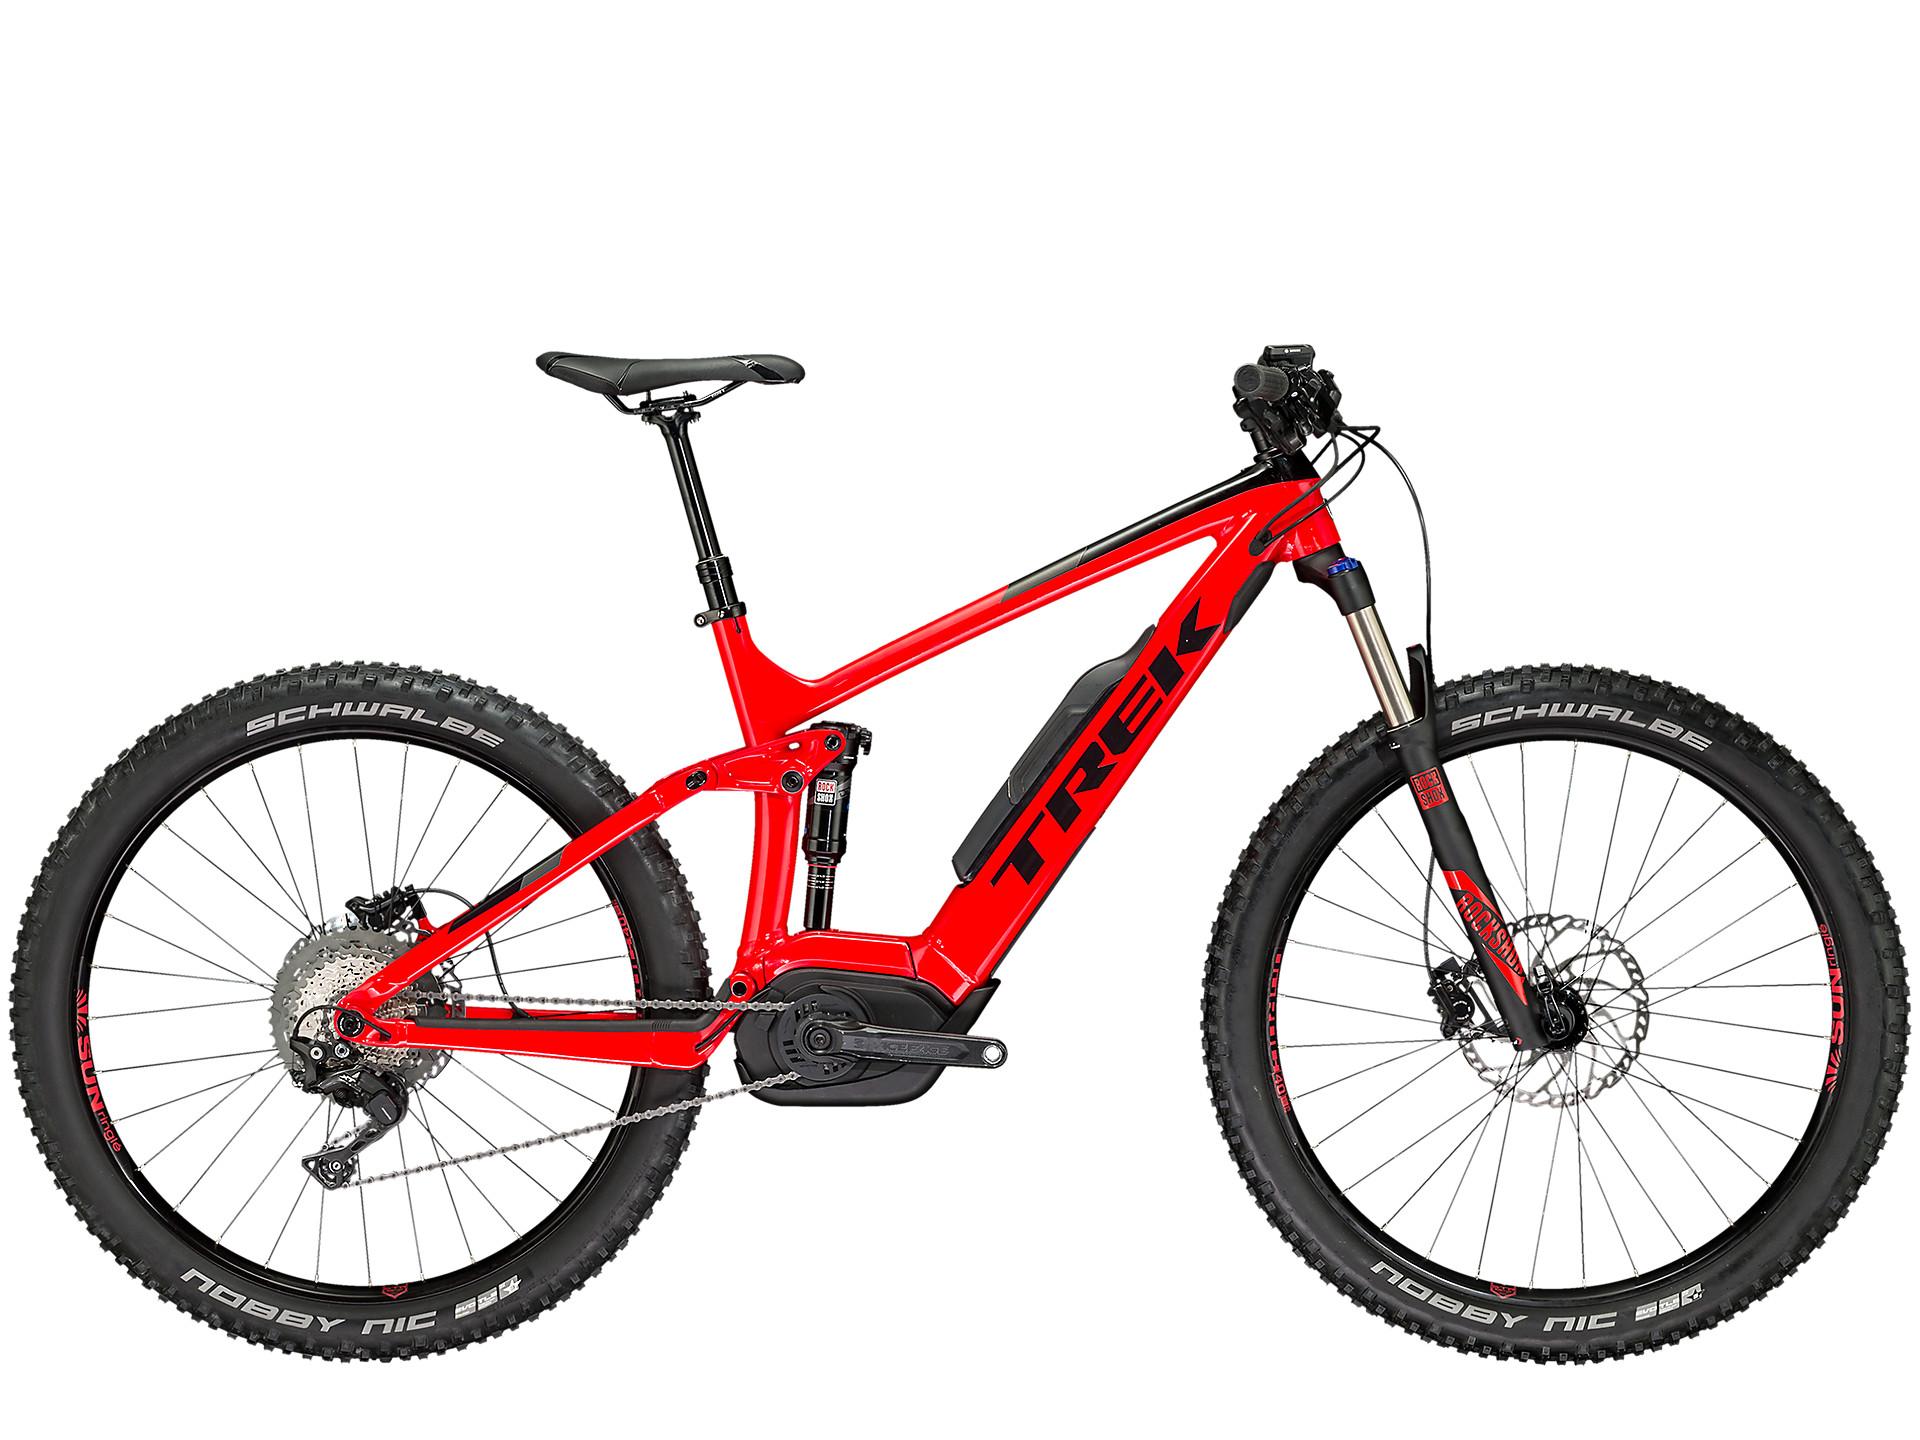 114a7d1dd87 Powerfly 7 FS Plus | Trek Bikes (FR)